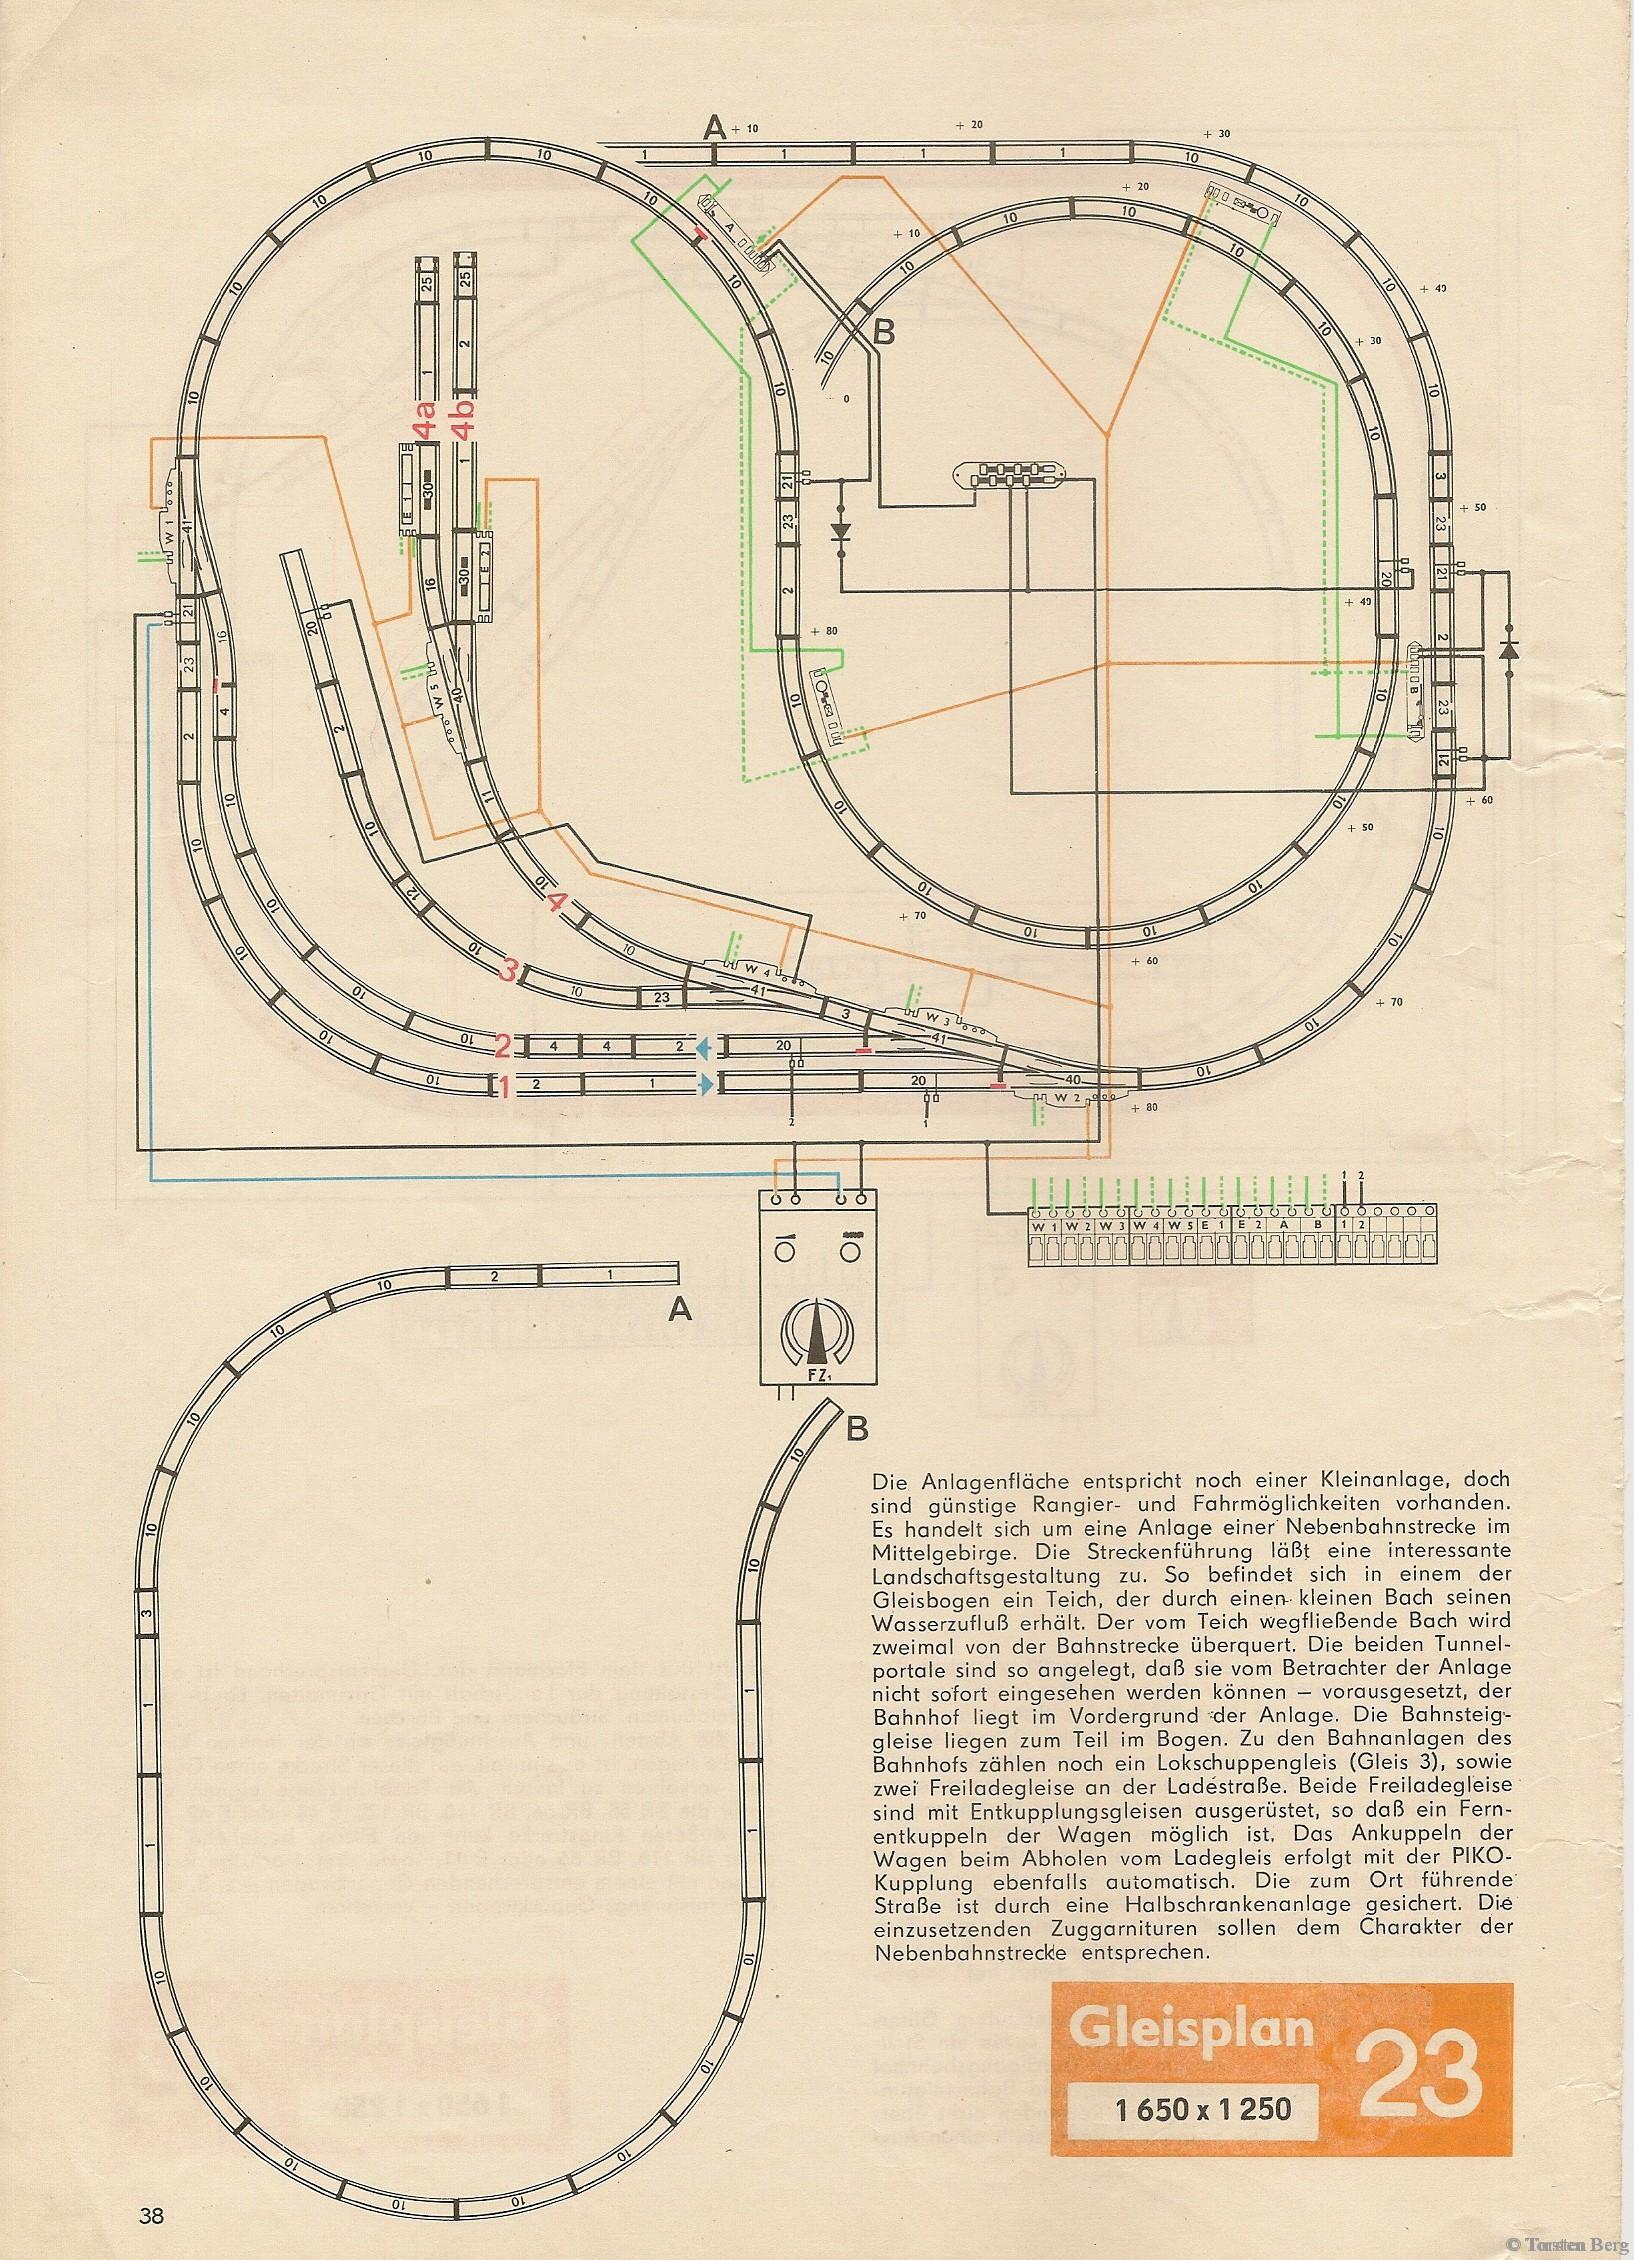 39 PIKO Standardgleis-Gleisplan 23